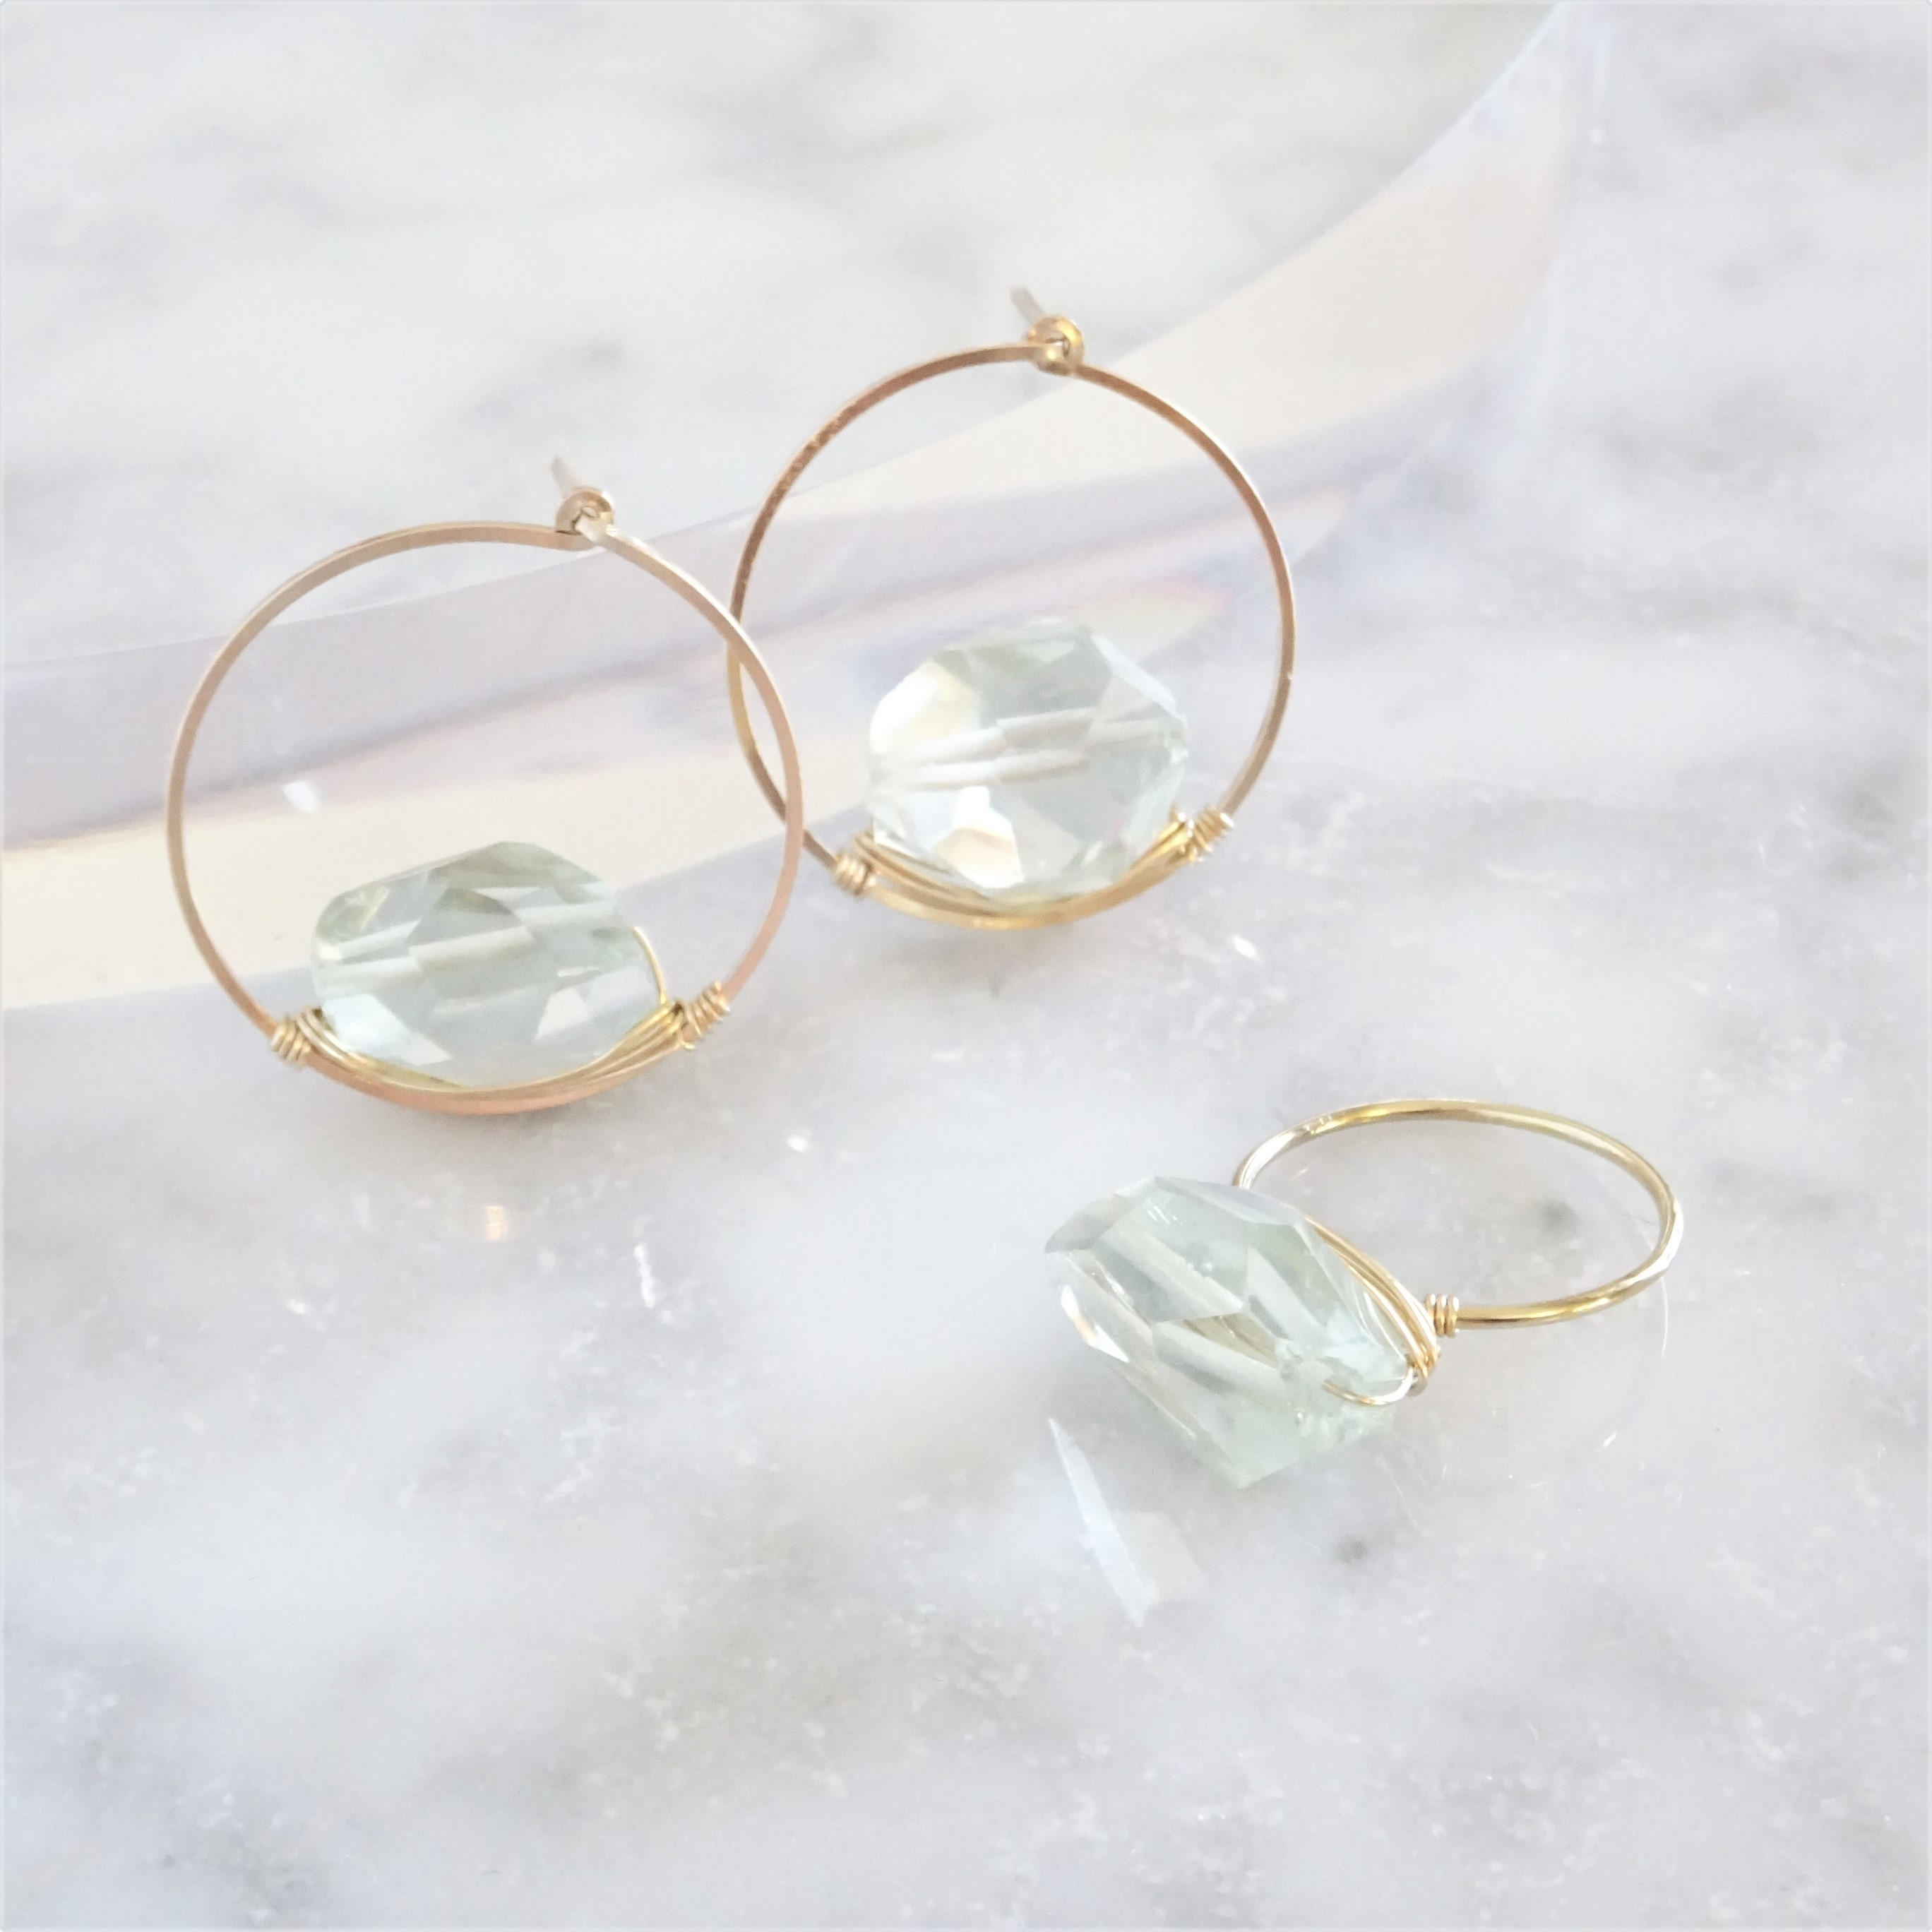 福袋14kgf*宝石質Amethyst wrapped ring + pierced earring